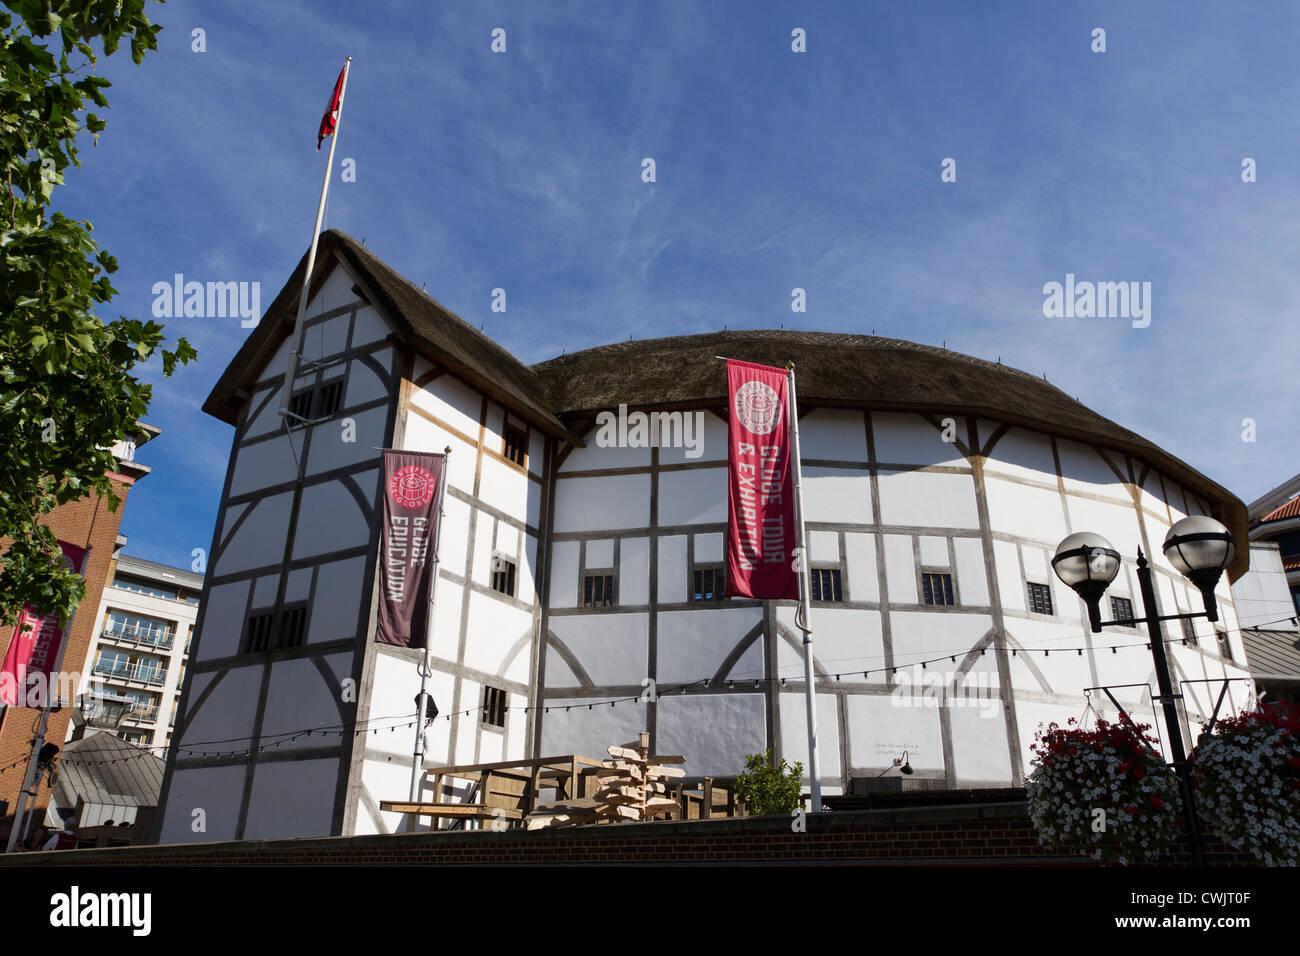 Shakespeare's Globe Theatre, Bankside, Southwark, London, England, UK - Stock Image